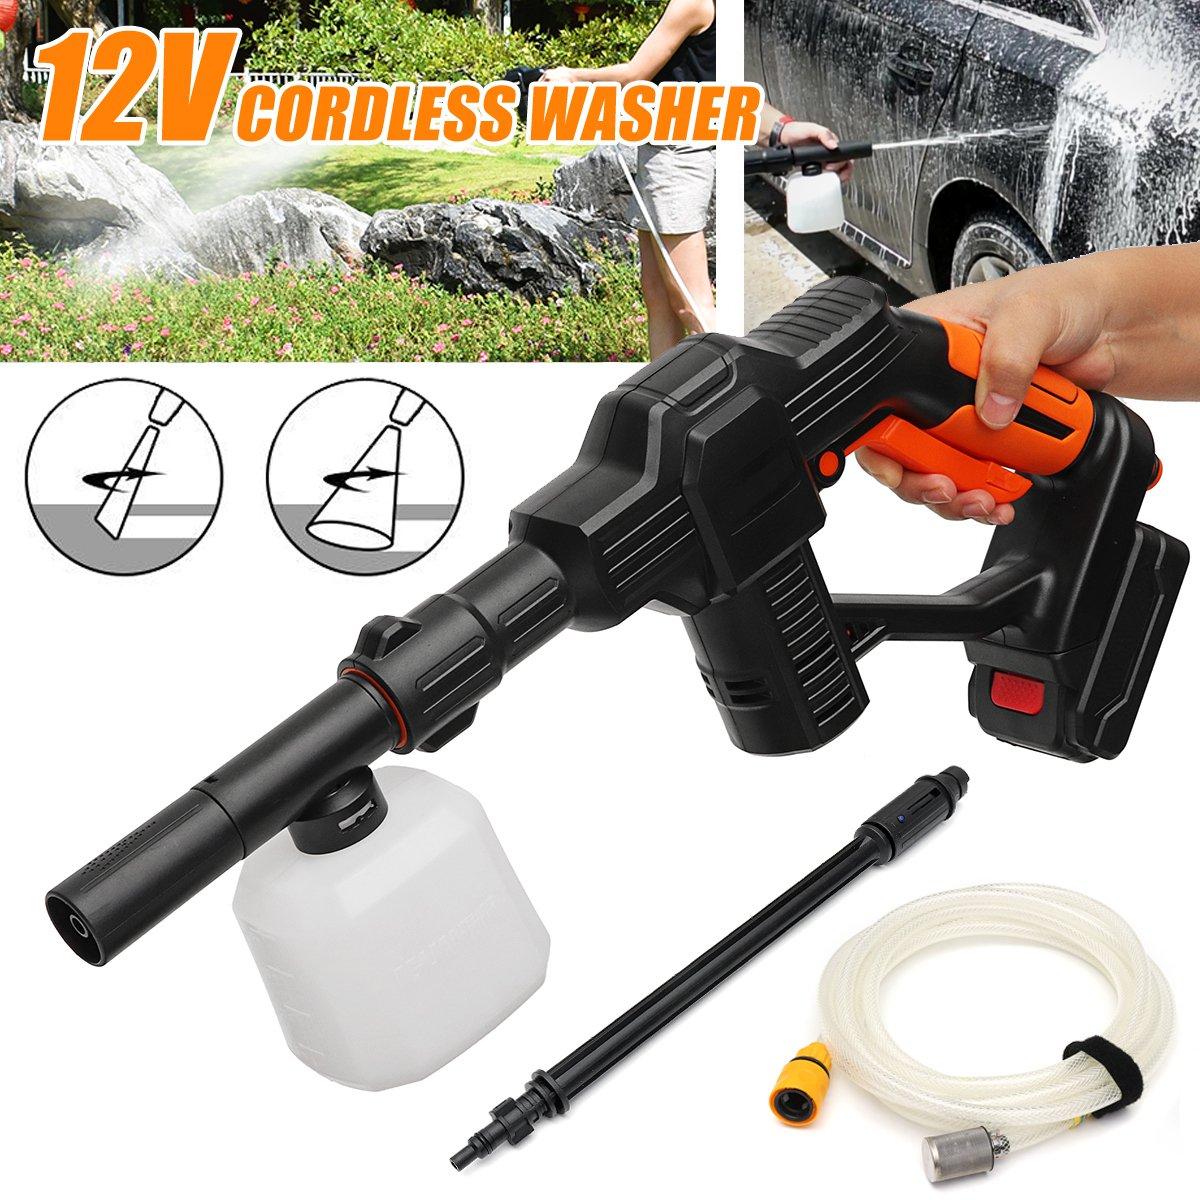 Spray High Pressure 130PSI Car Washer Cordless Water-Gun Sprayer Cleaner Spray Foam Lance + 5m Hose For Car Home Garden Cleaning